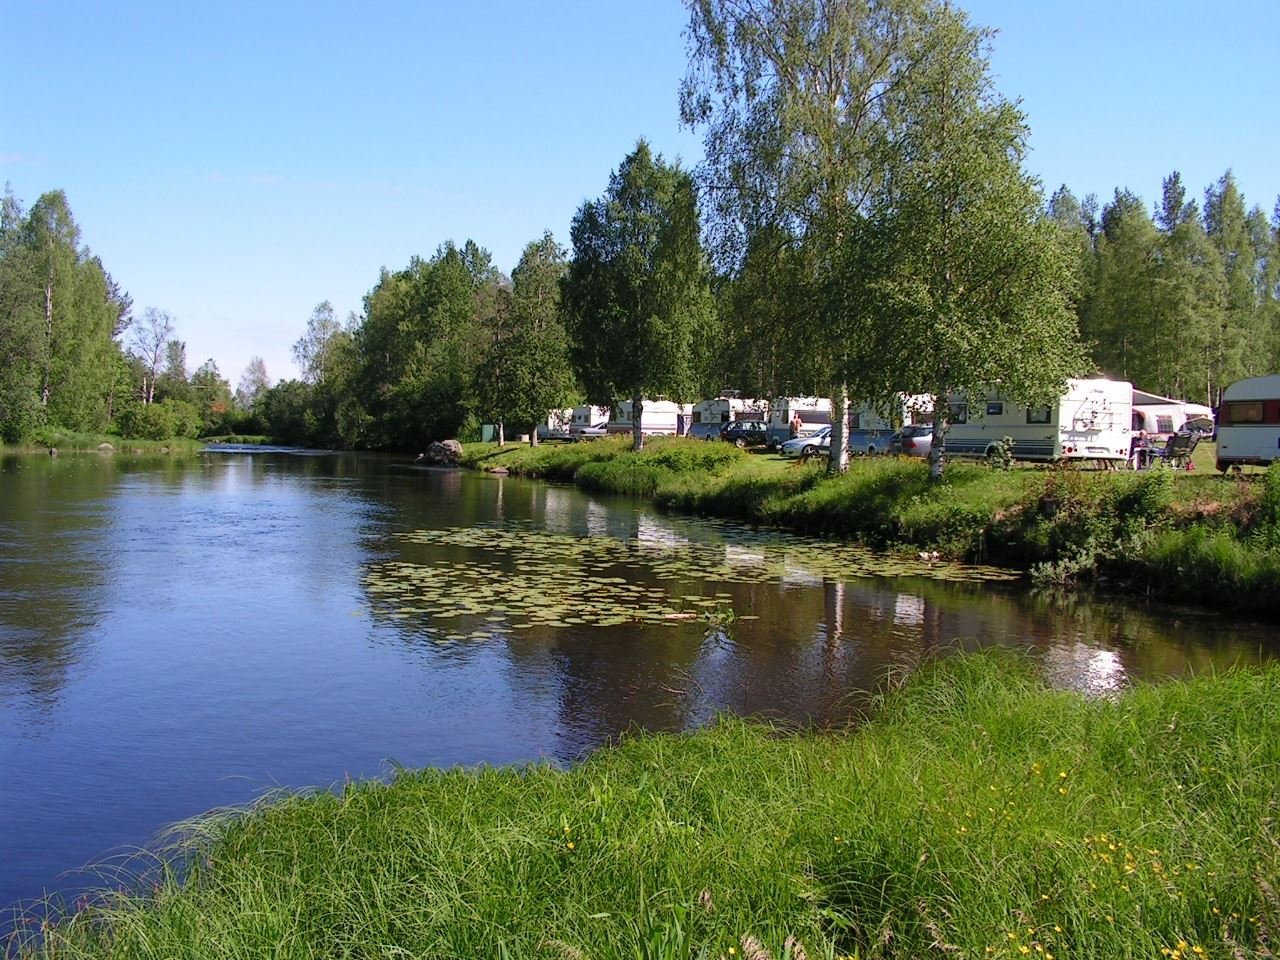 Bureå Camping/Camping